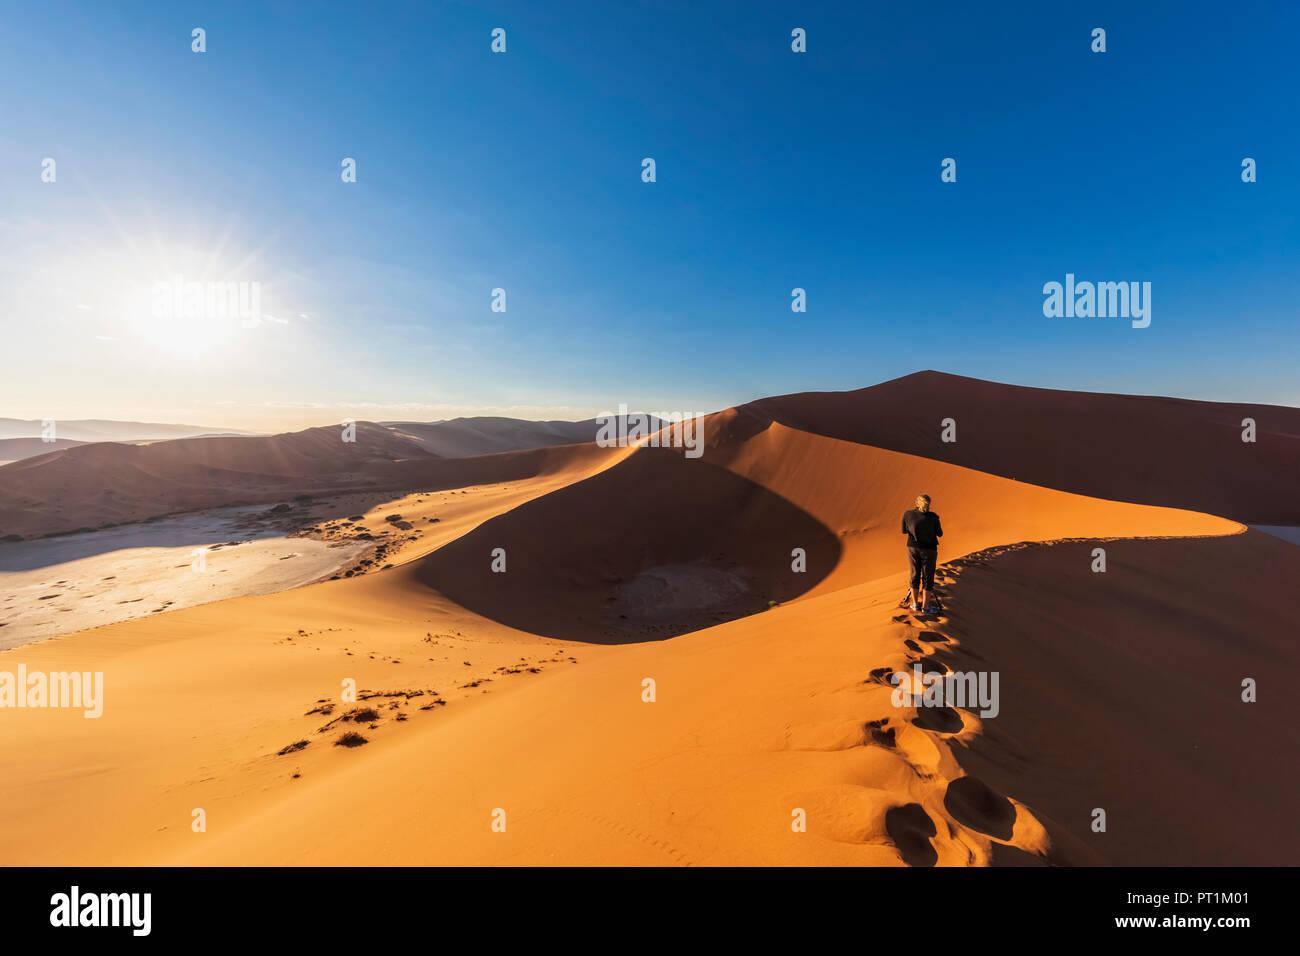 Africa, Namibia, Namib desert, Naukluft National Park, woman on sand dune 'Big Daddy' - Stock Image